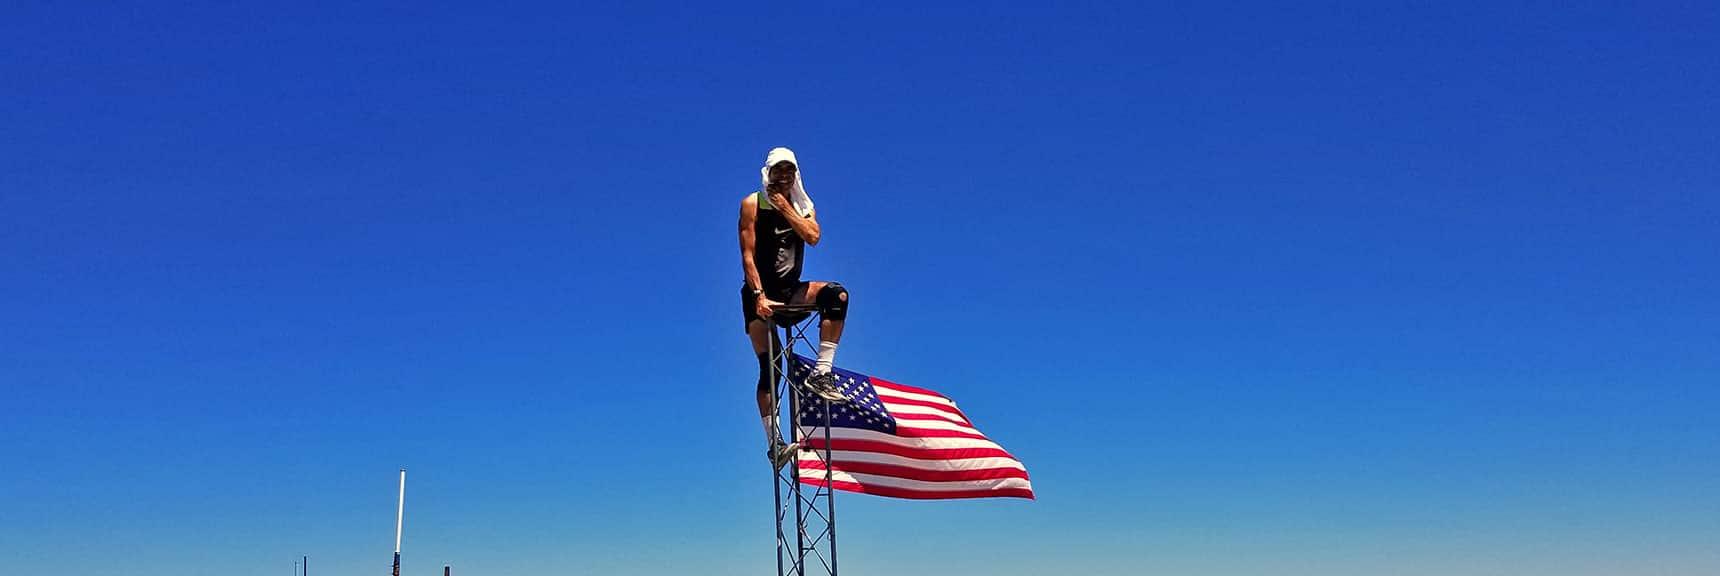 David Smith on Charleston Peak Summit | Griffith Peak & Charleston Peak Circuit Run, Spring Mountains, Nevada